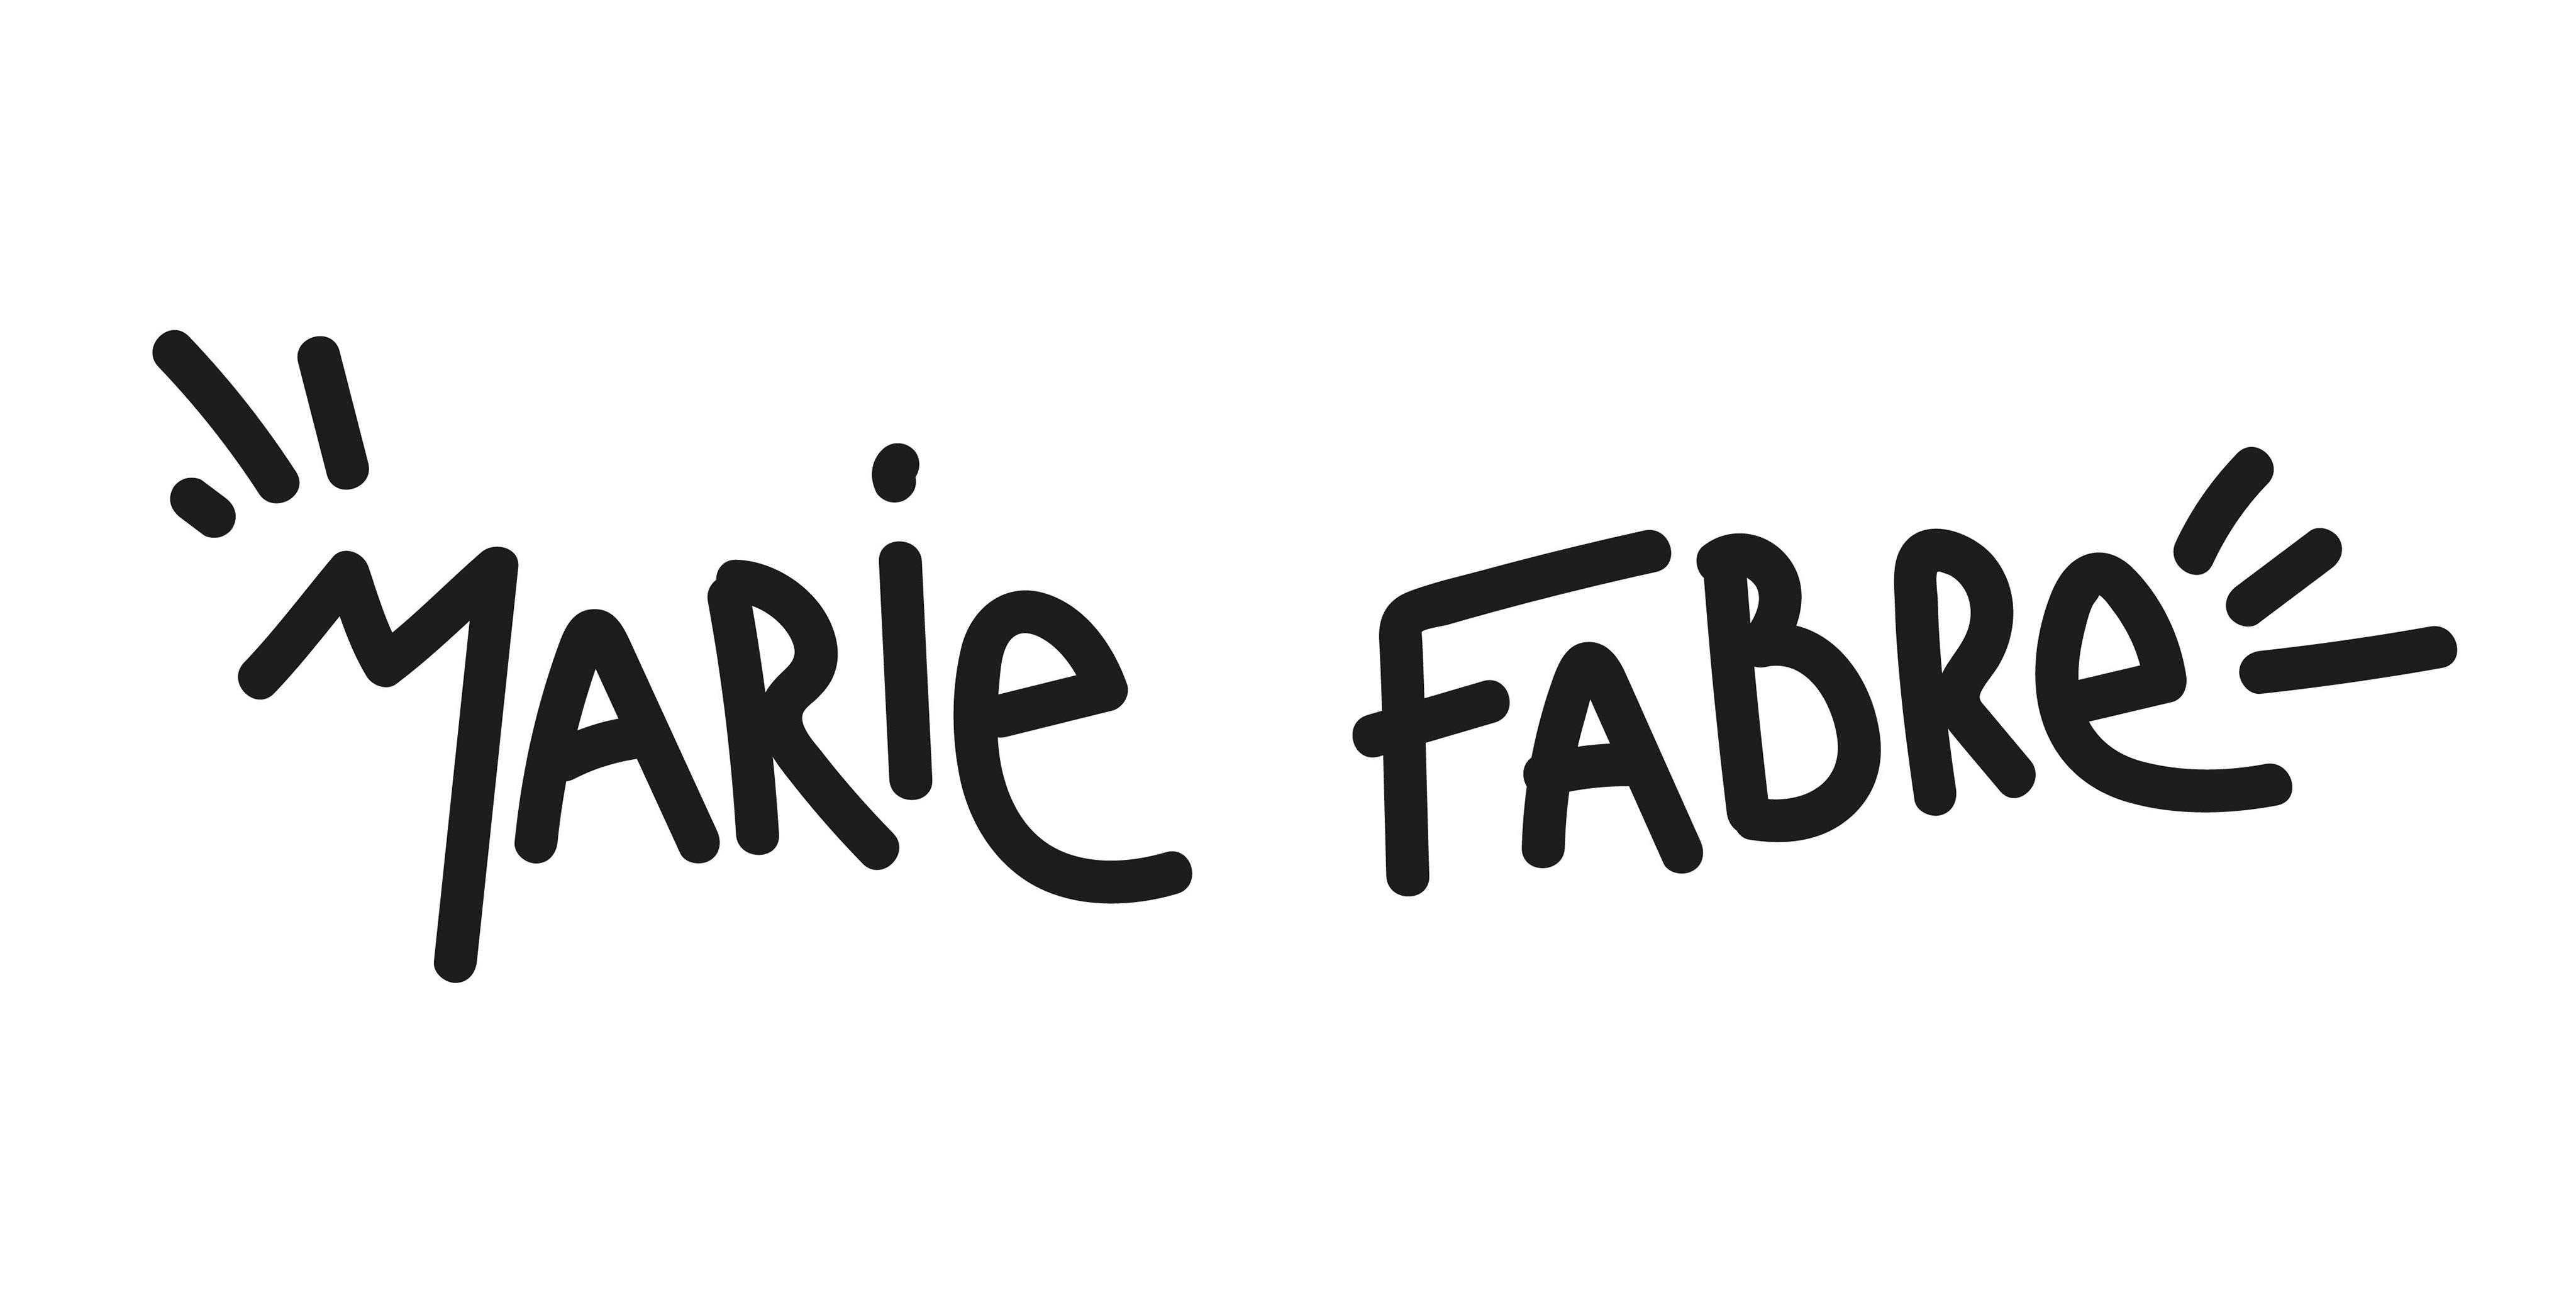 Marie Fabre